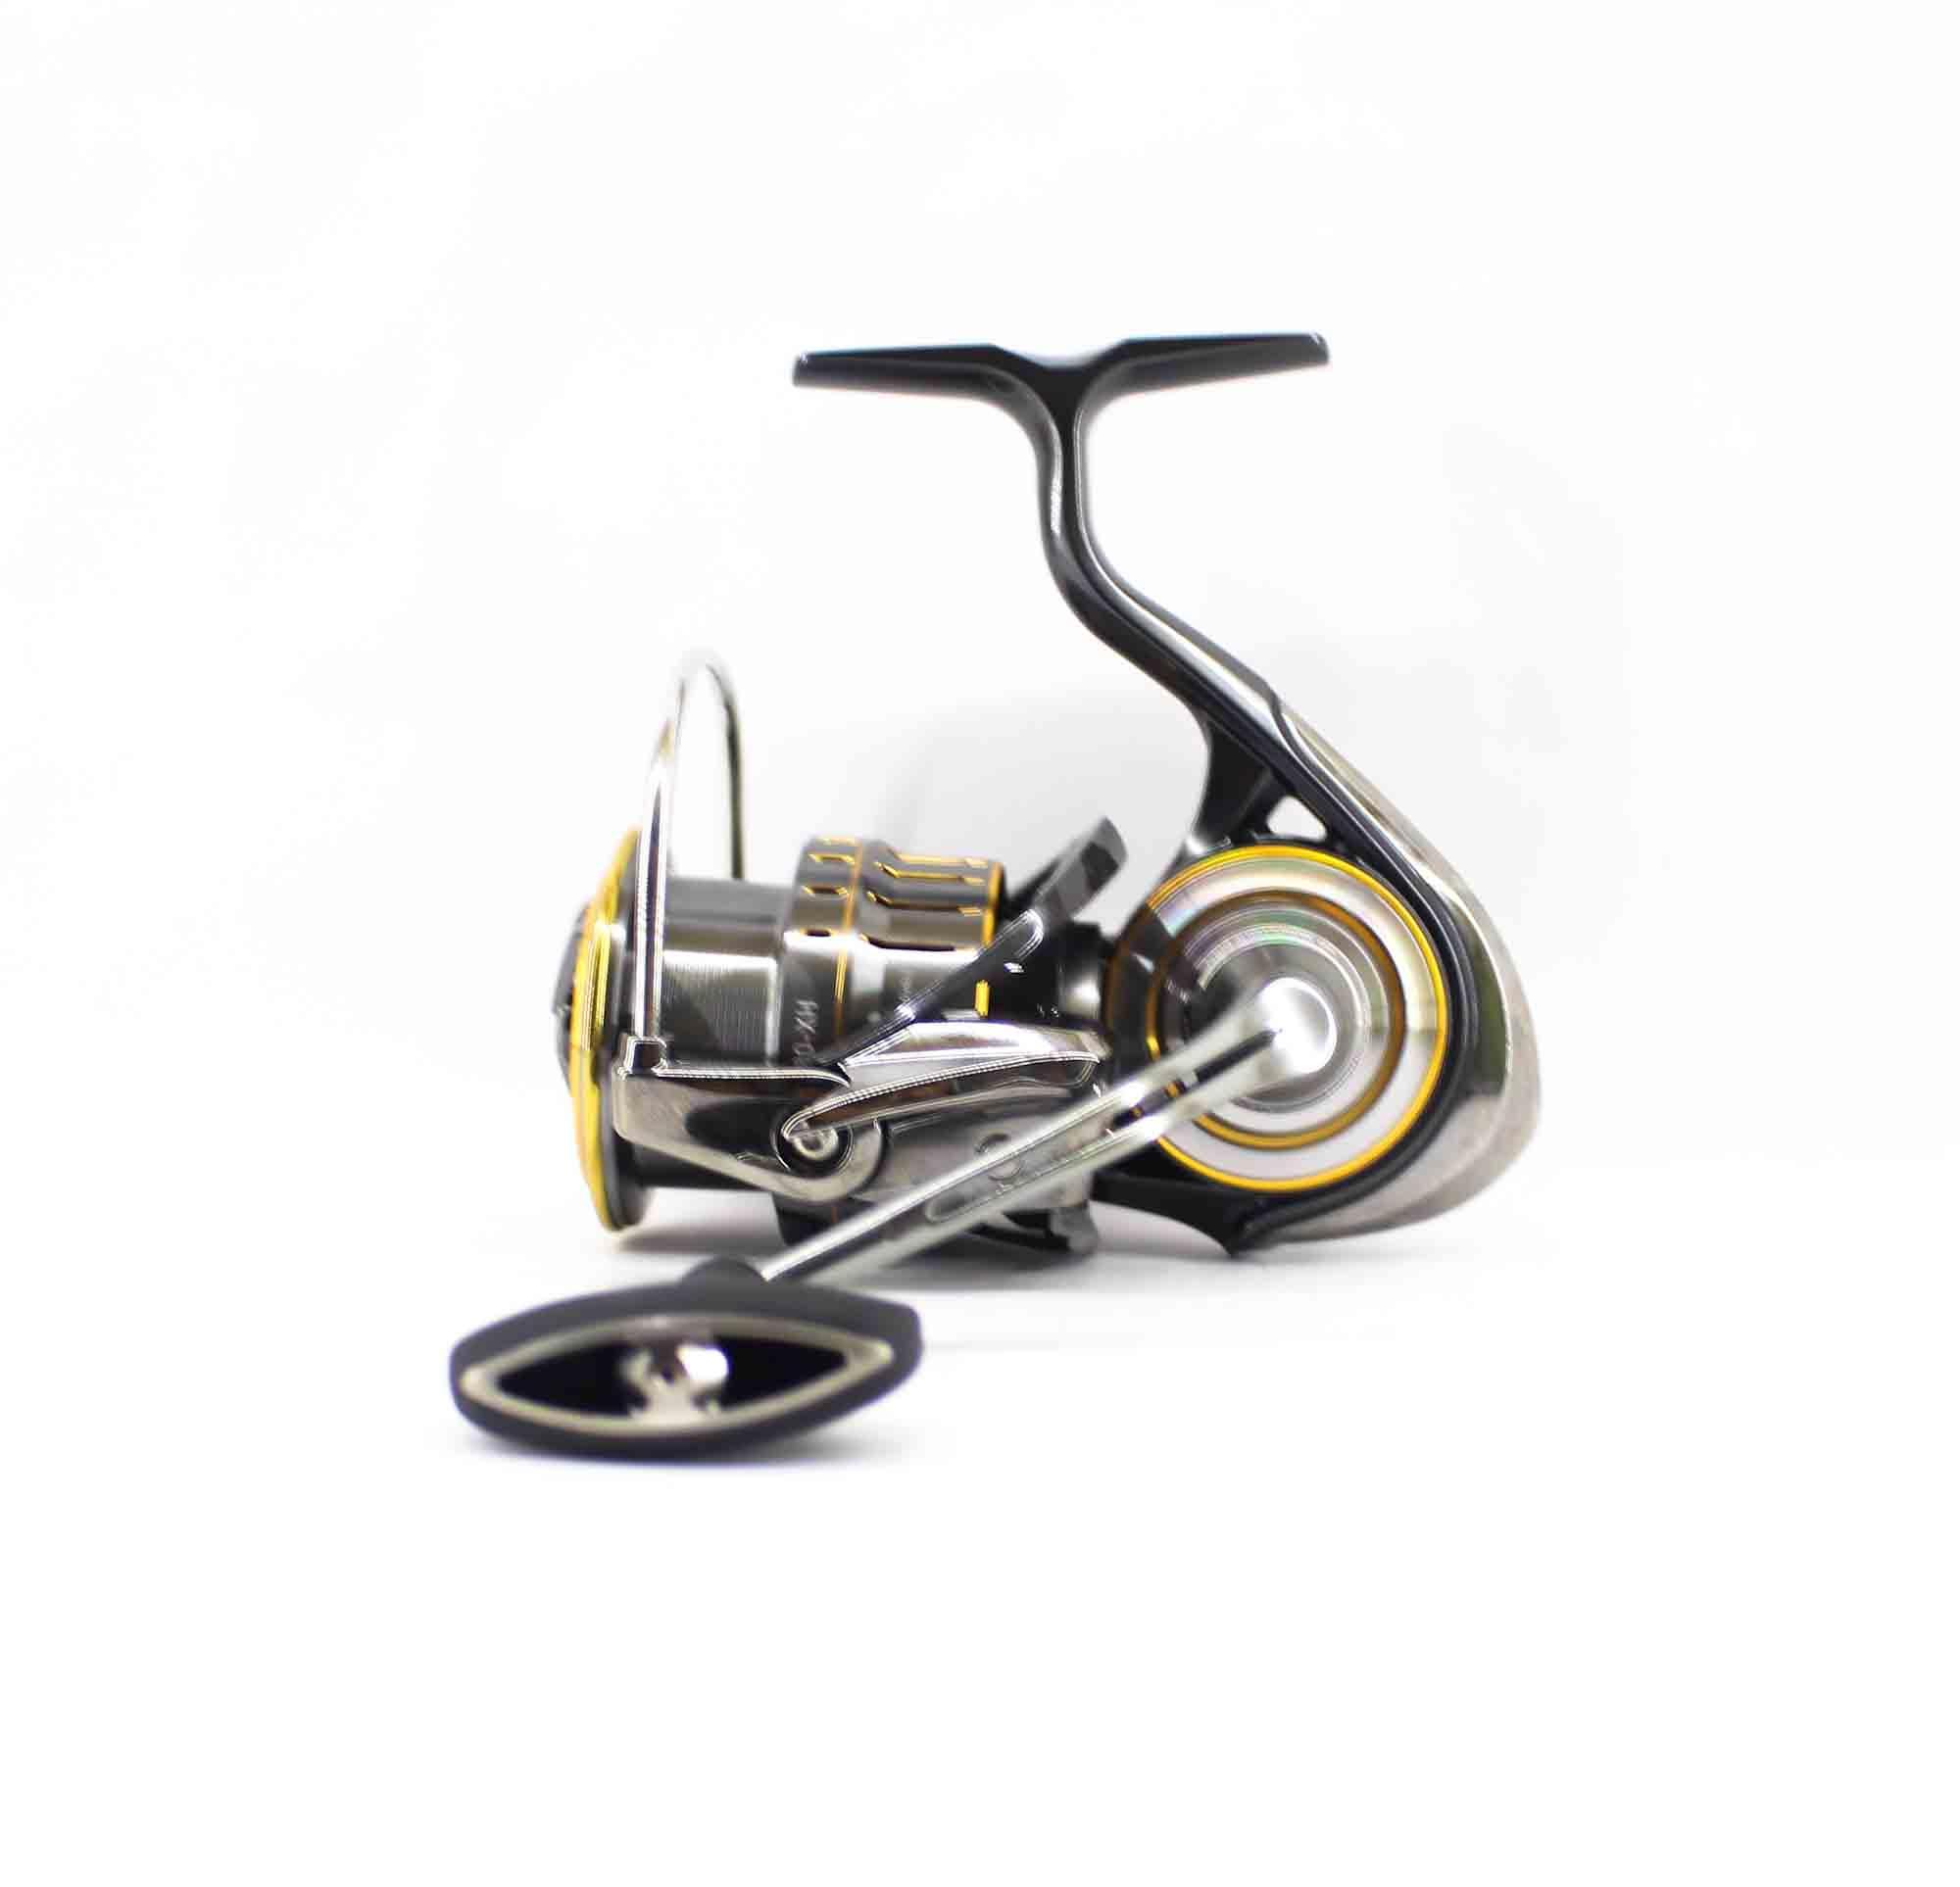 Daiwa Reel Spinning 21 Luvias Airity LT3000-XH (9638)